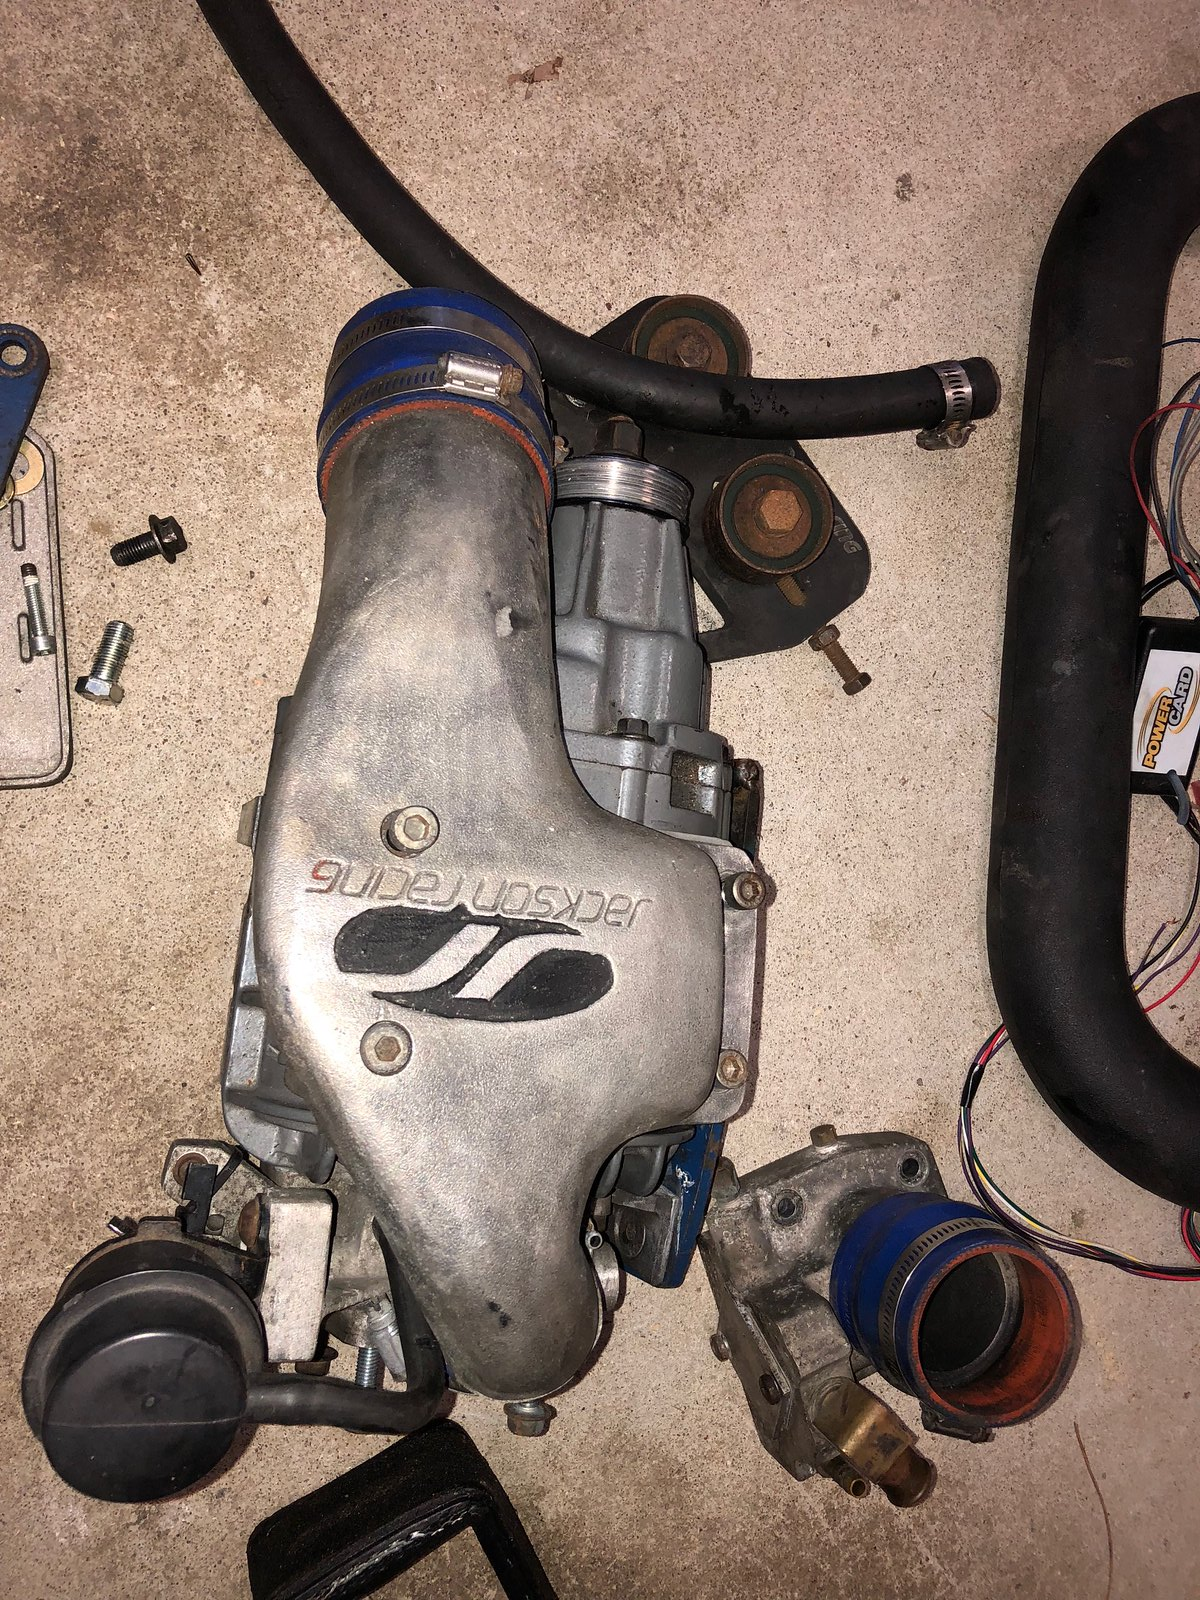 NB] used jackson racing kit on a daily - MX-5 Miata Forum